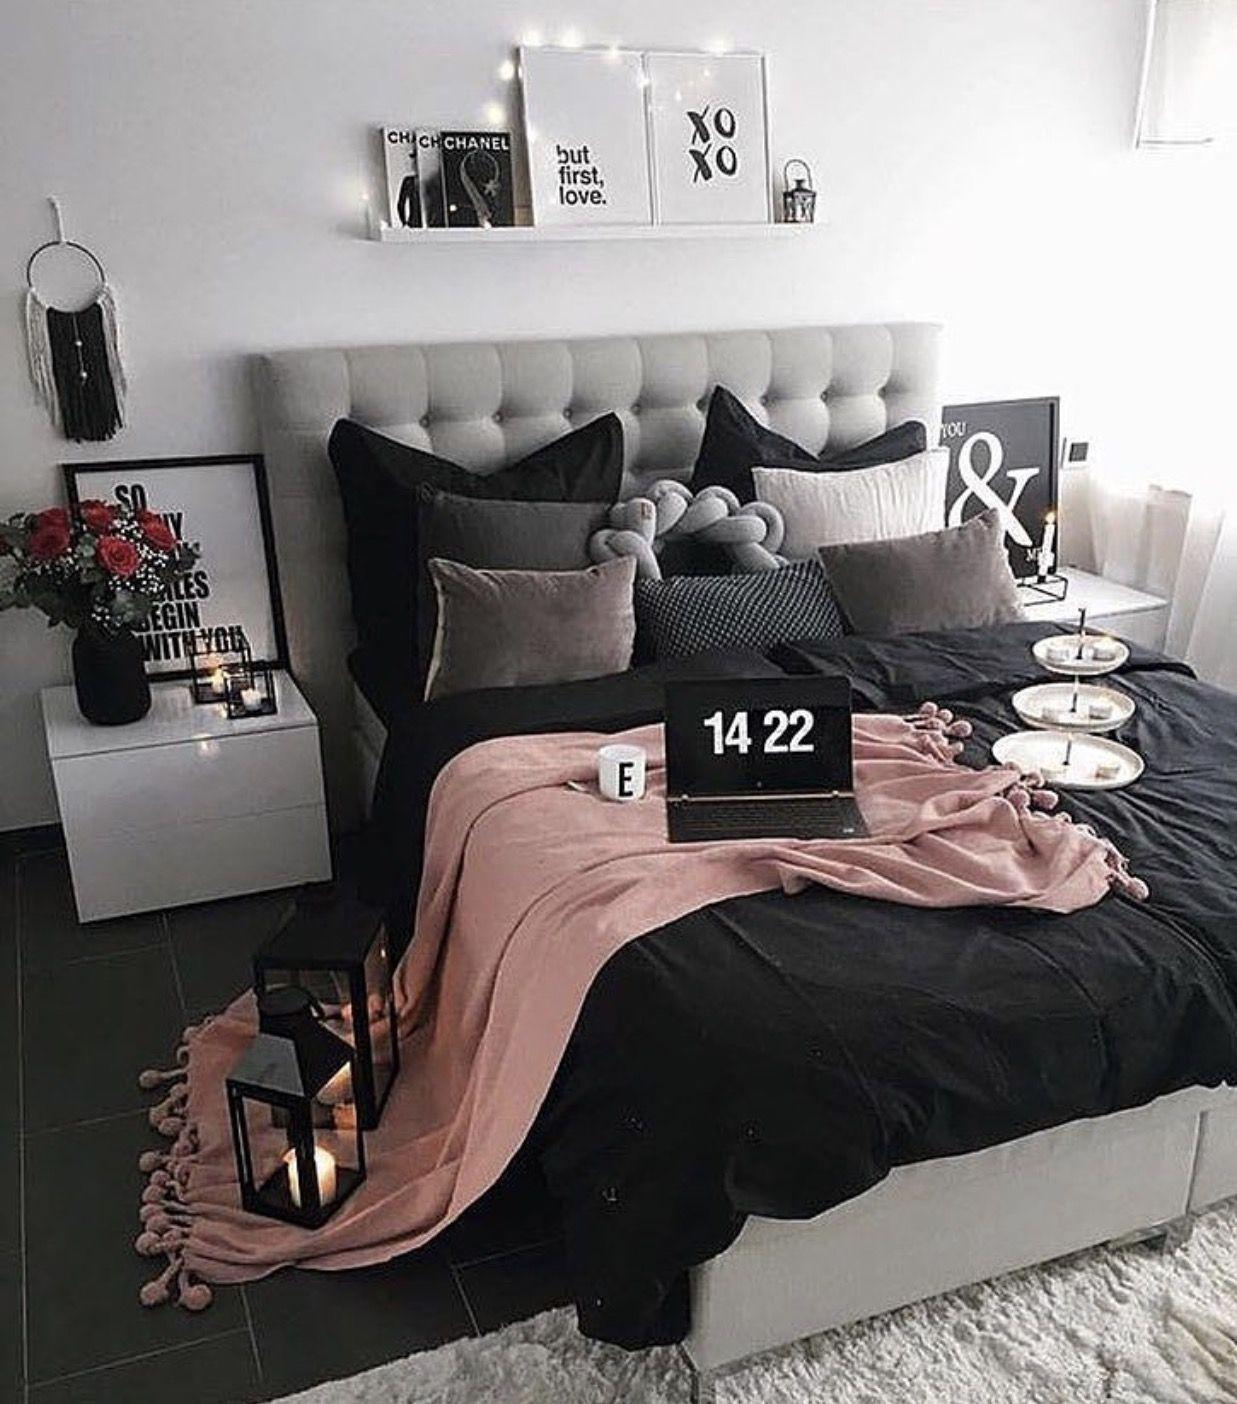 Iu0027m really loving the black on gray